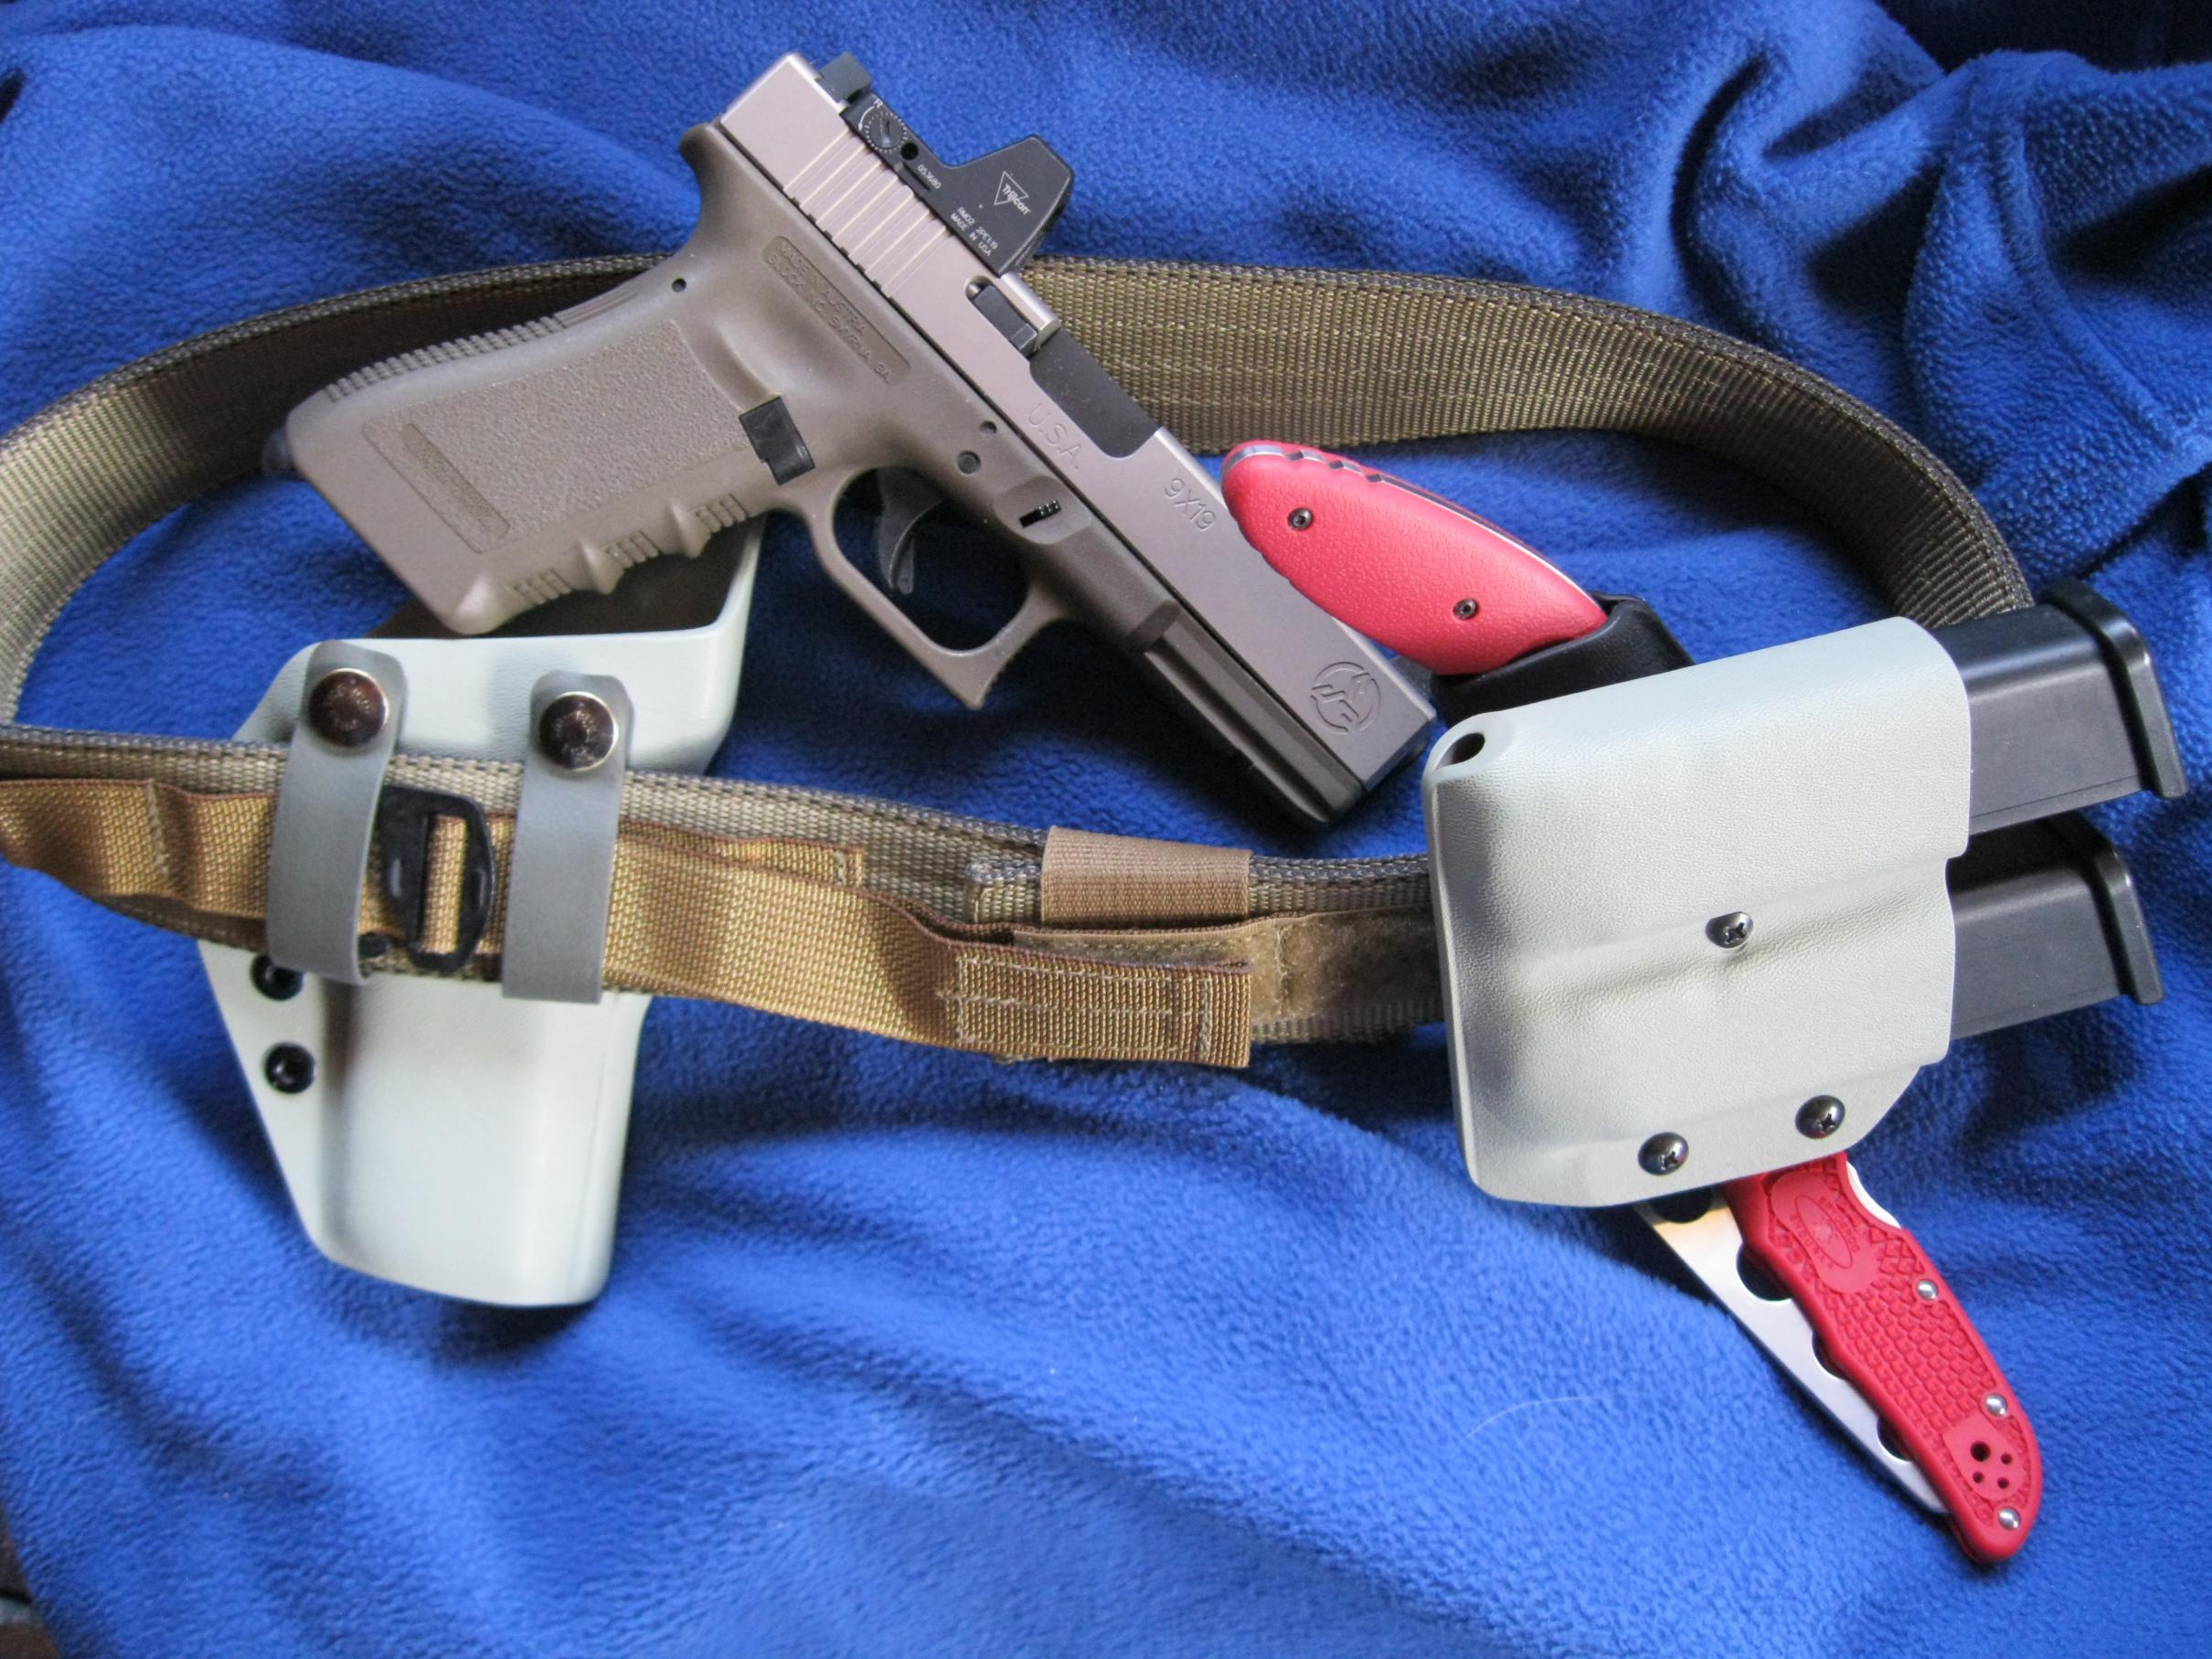 Glock 17 Appendix Carry-img_0054.jpg